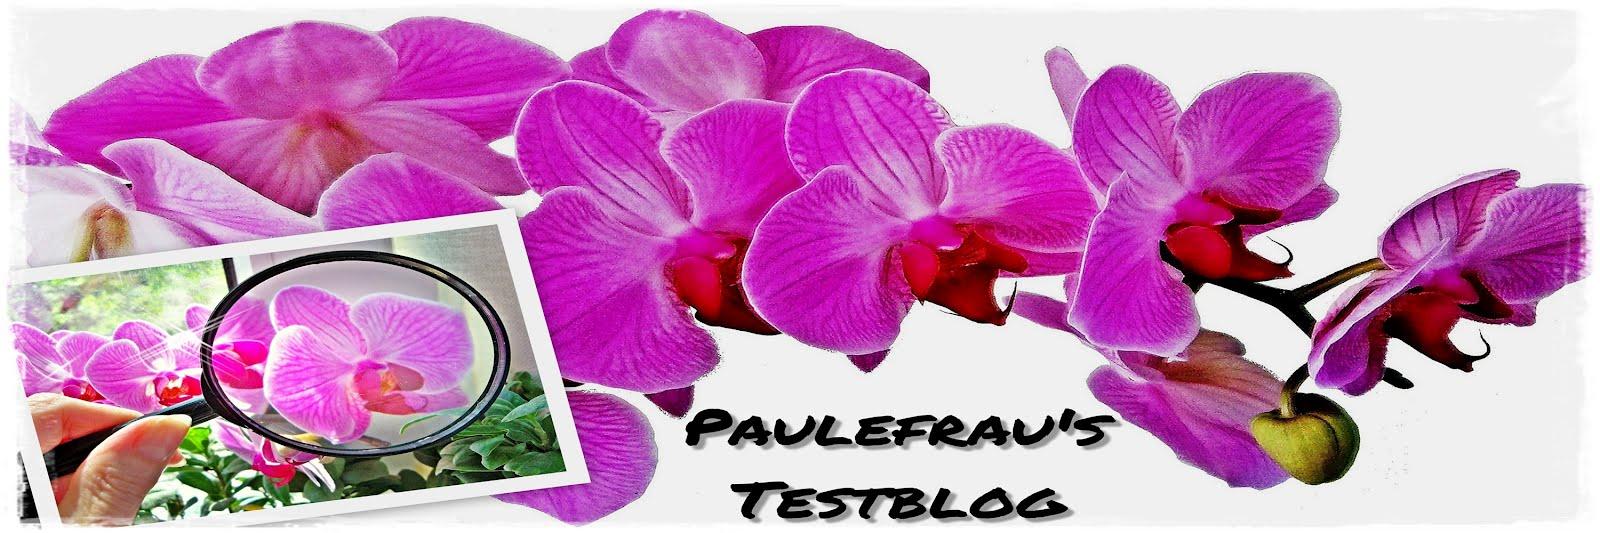 Paulefrau´s Testblog